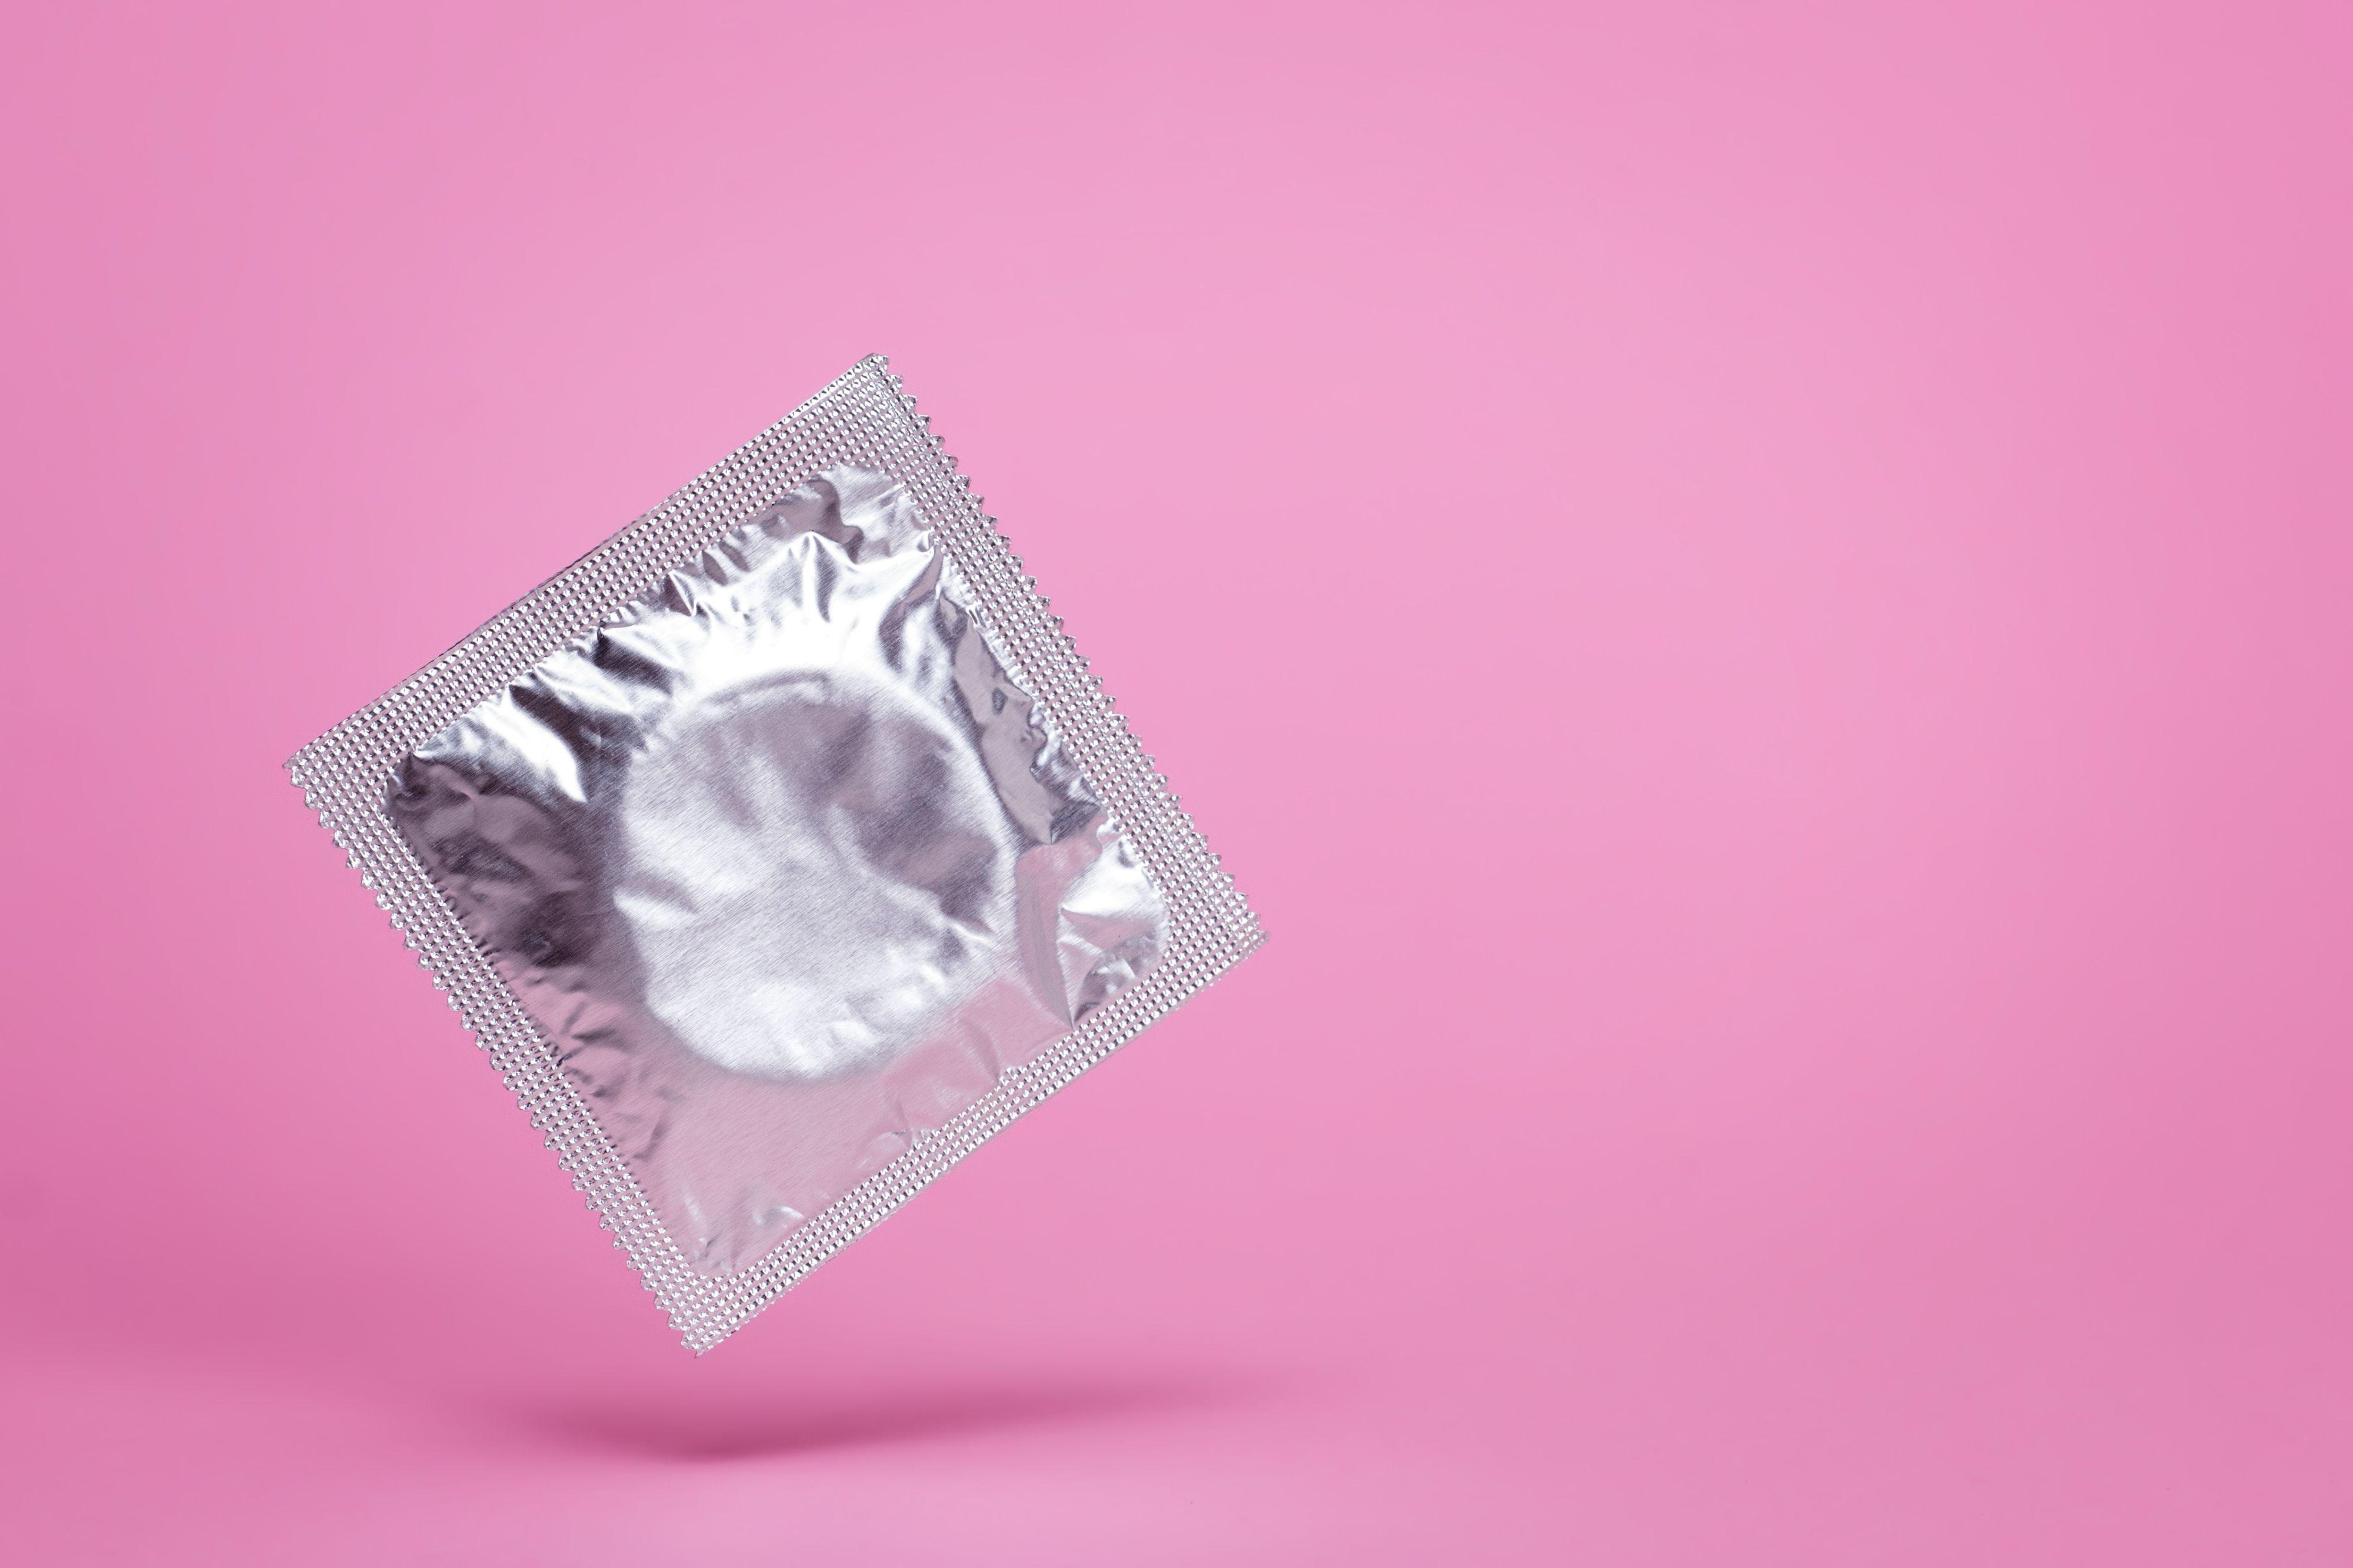 Premature ejaculation condoms